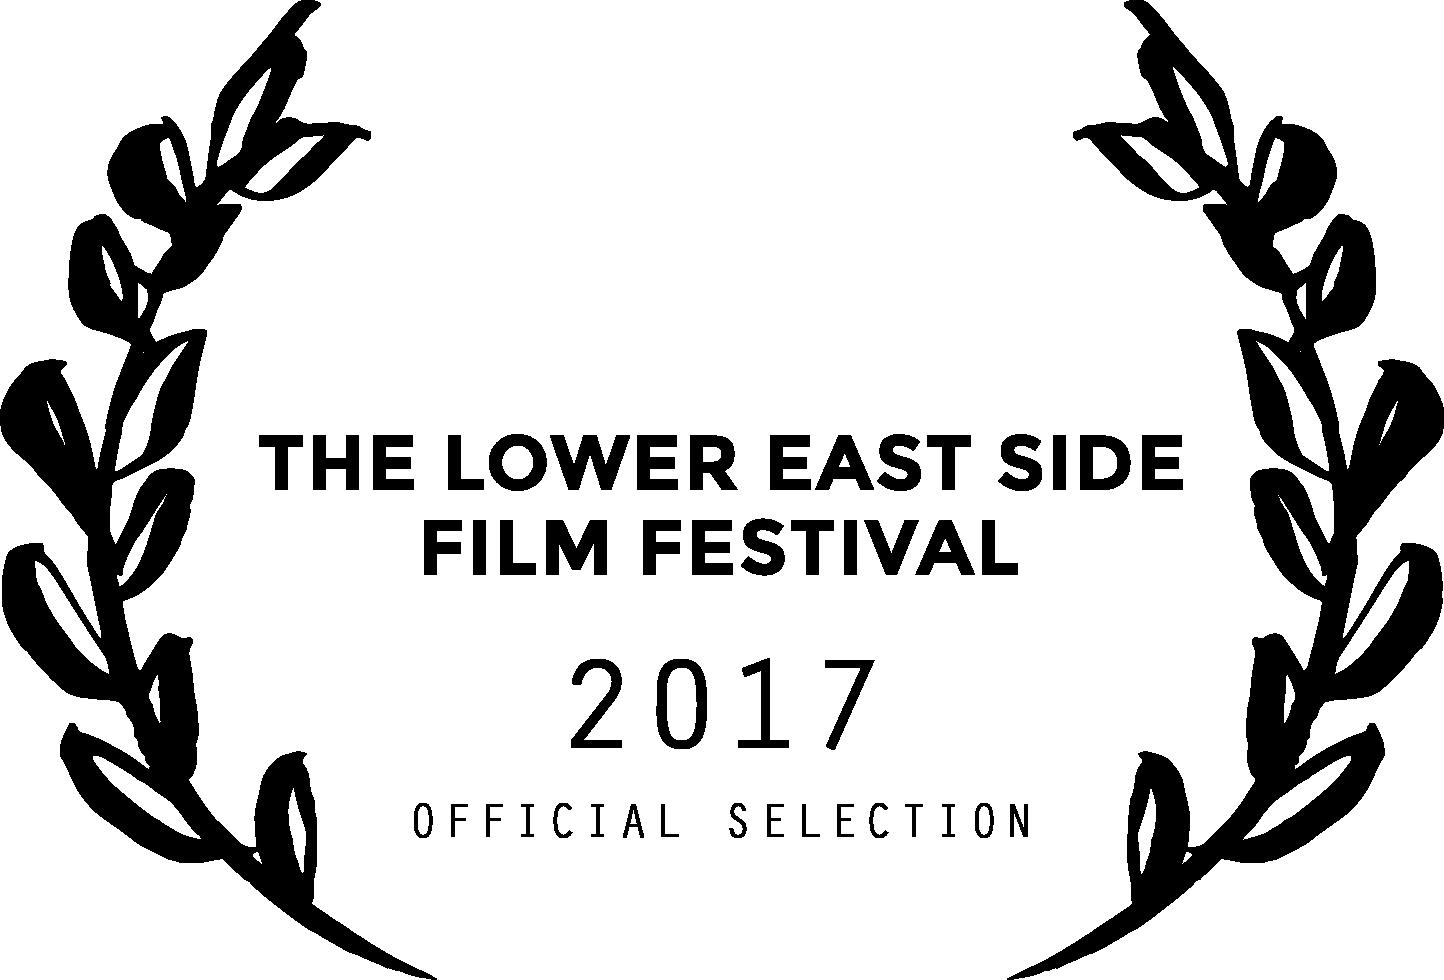 LESFF_2017_Official_Selection_Laurel_black.png